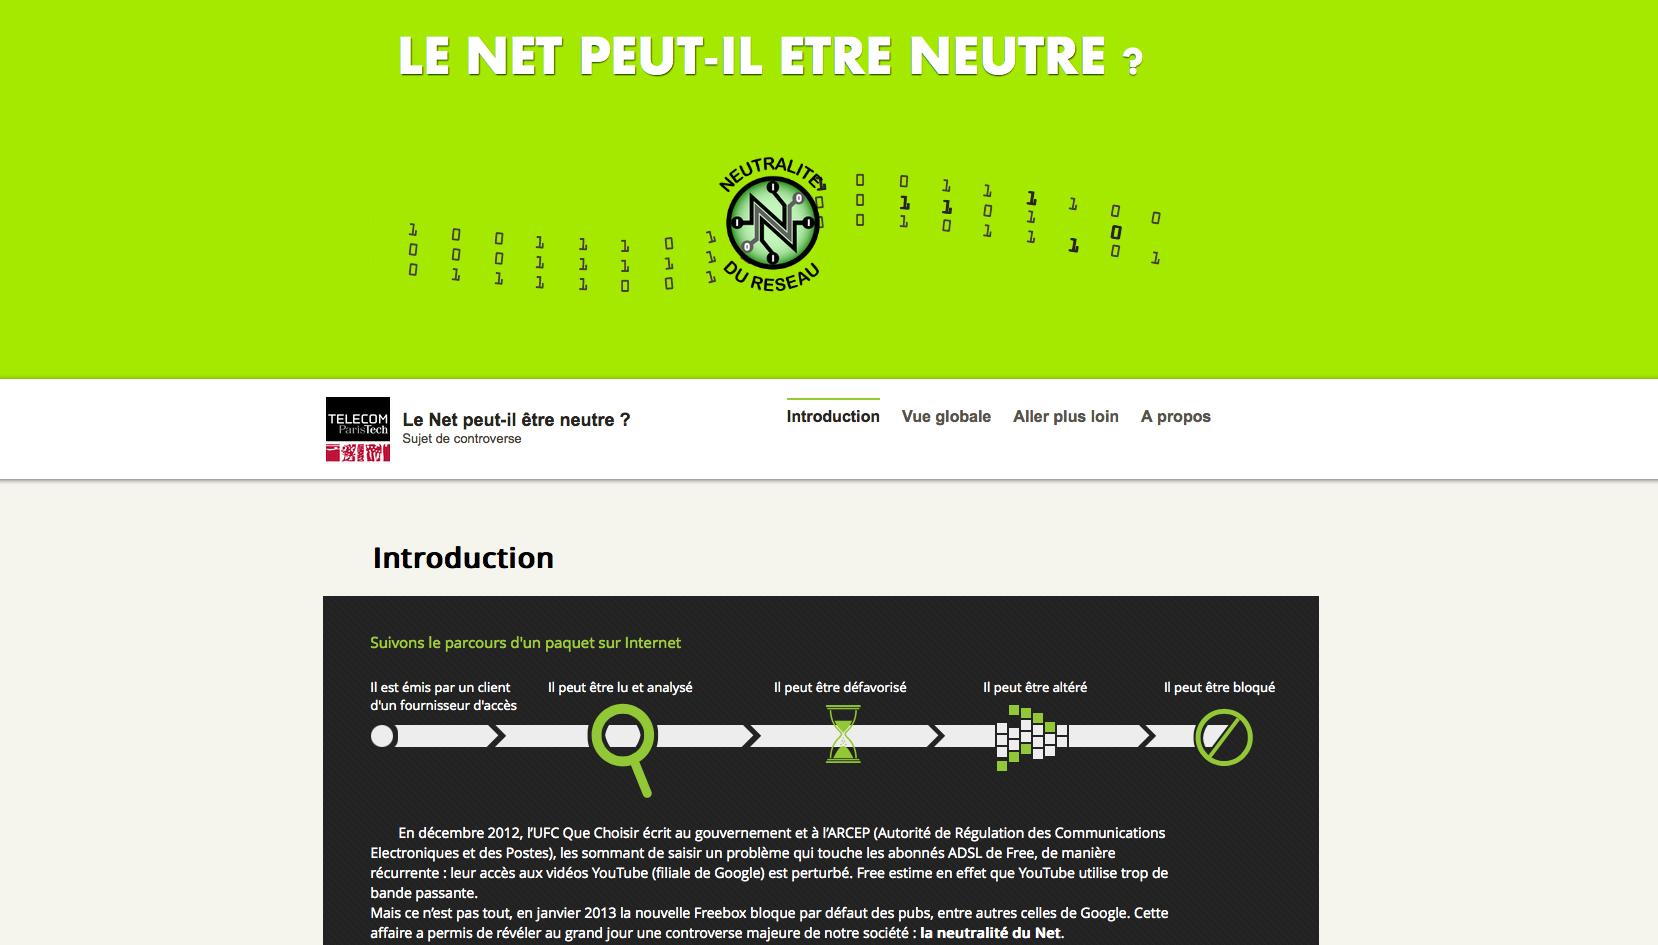 Neutralite-du-net